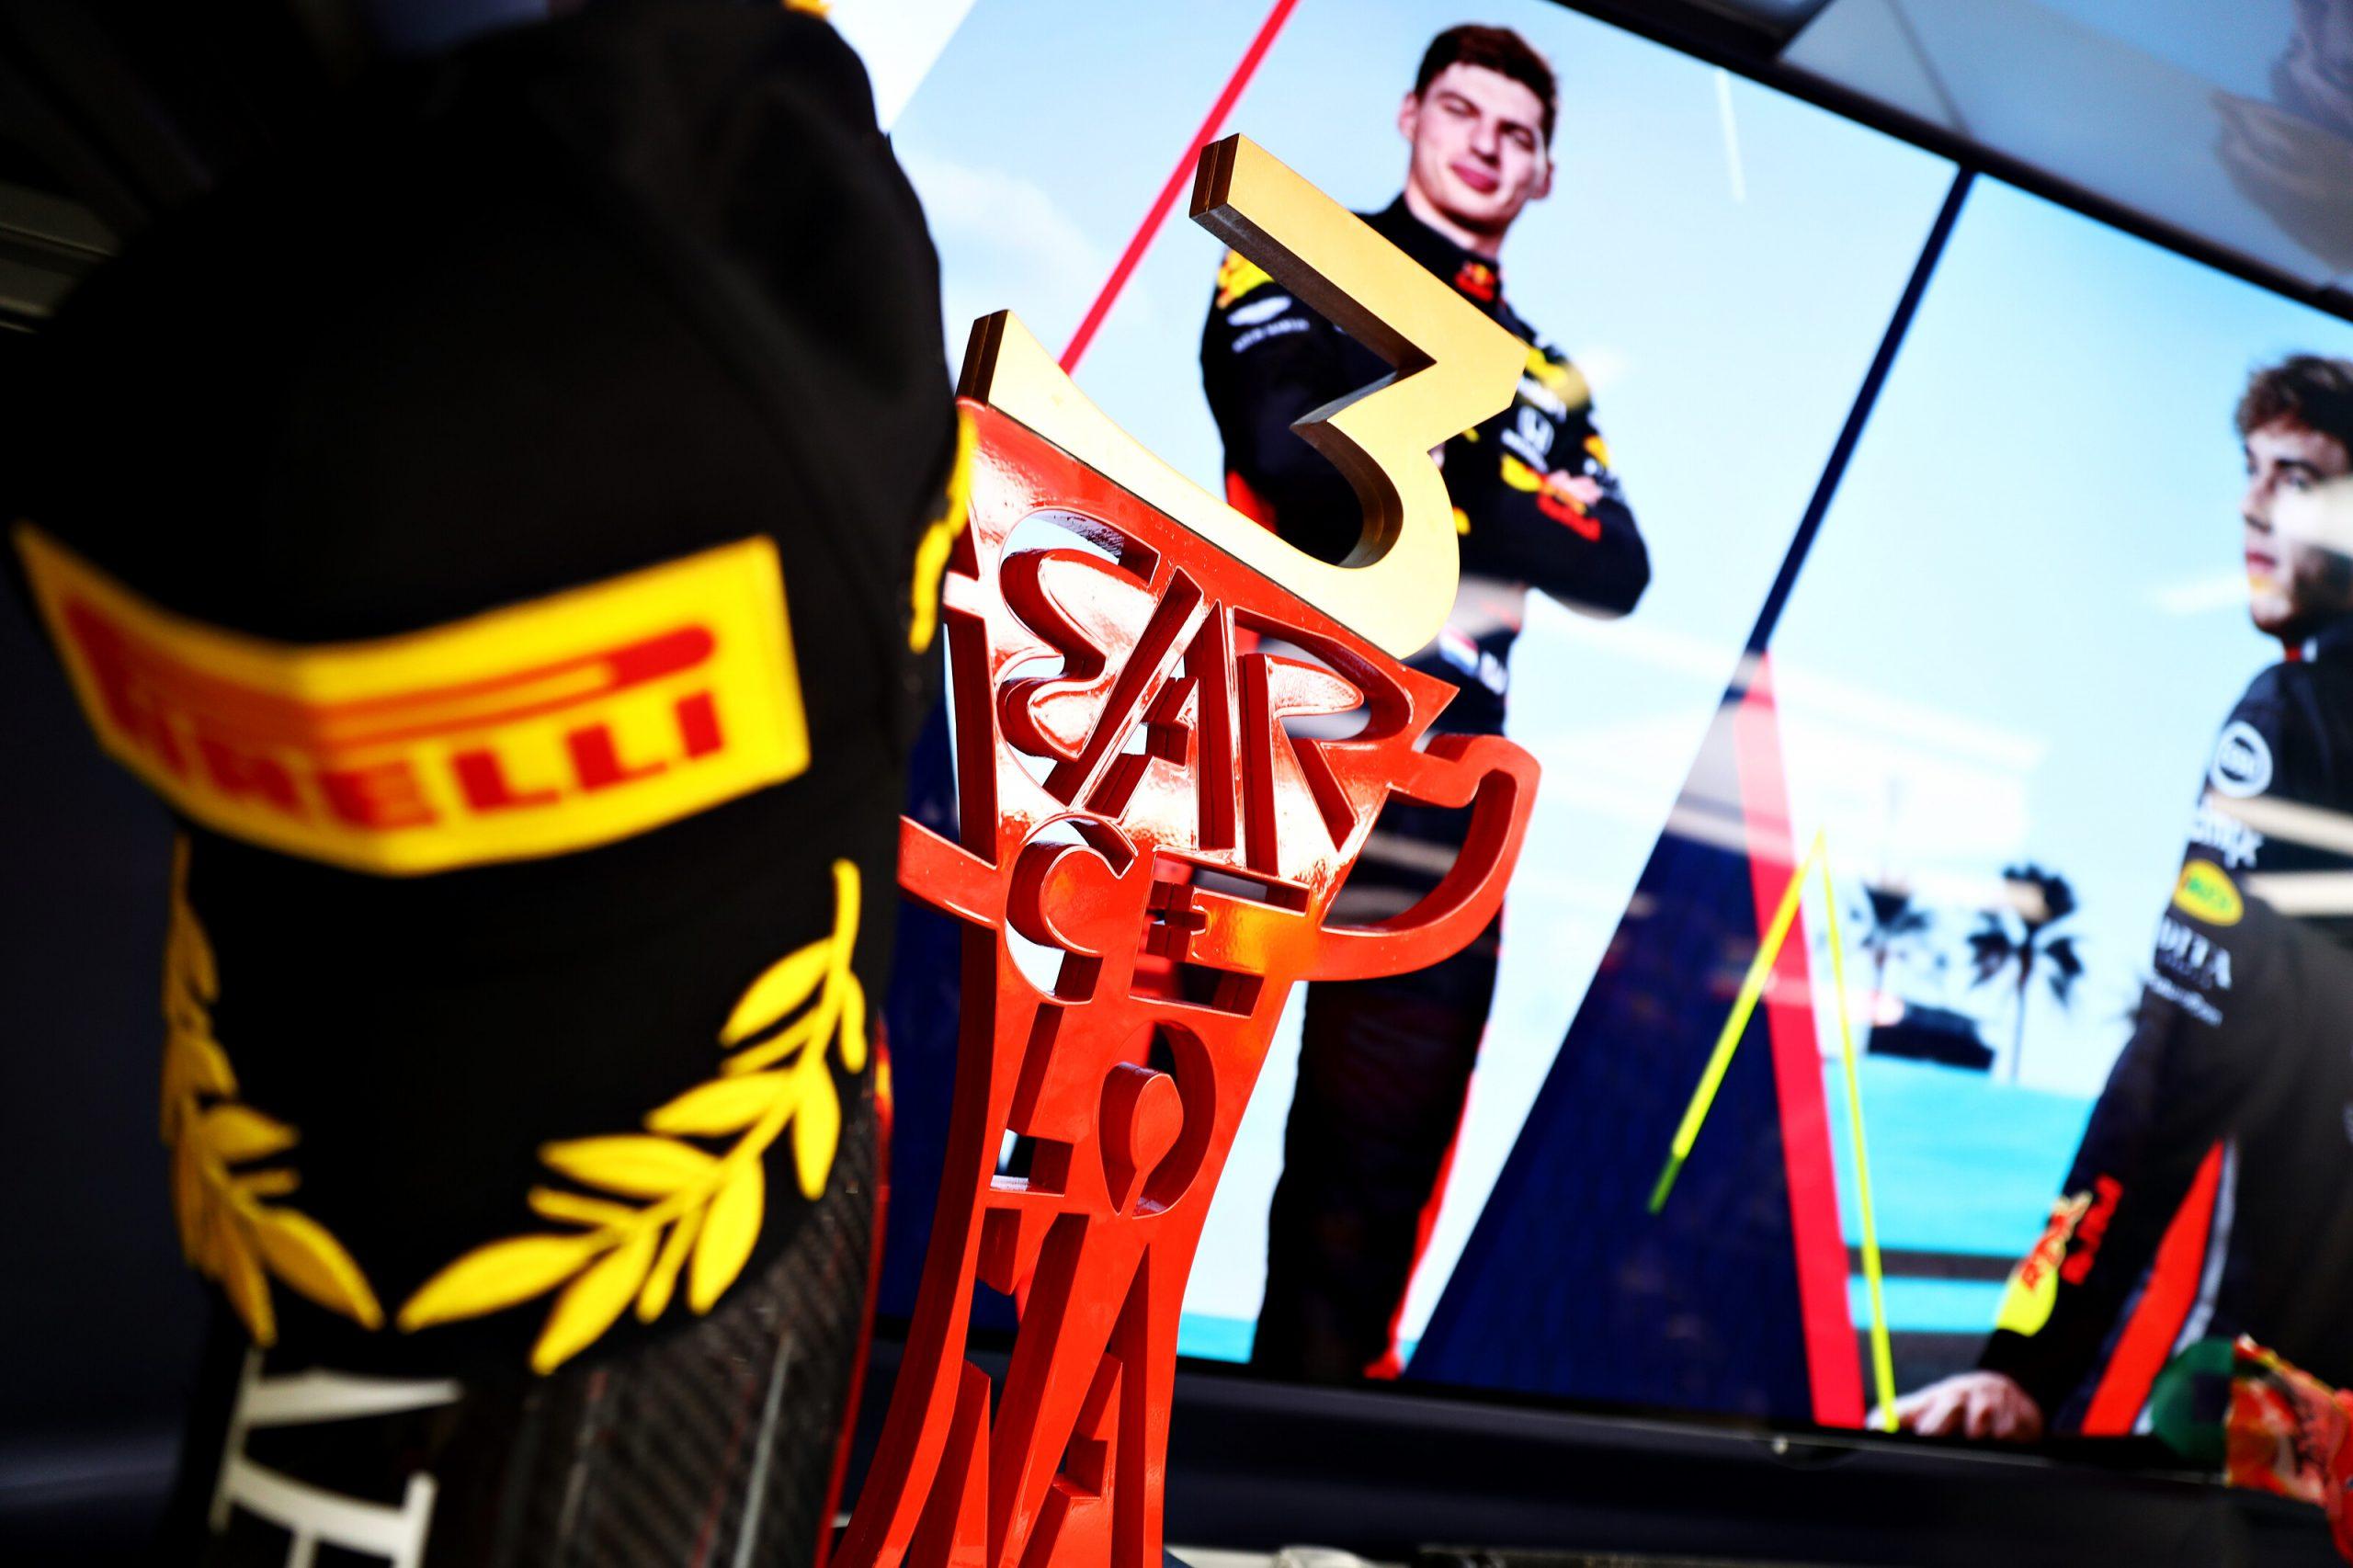 F1 - Les horaires du Grand Prix d'Espagne 2020 de F1